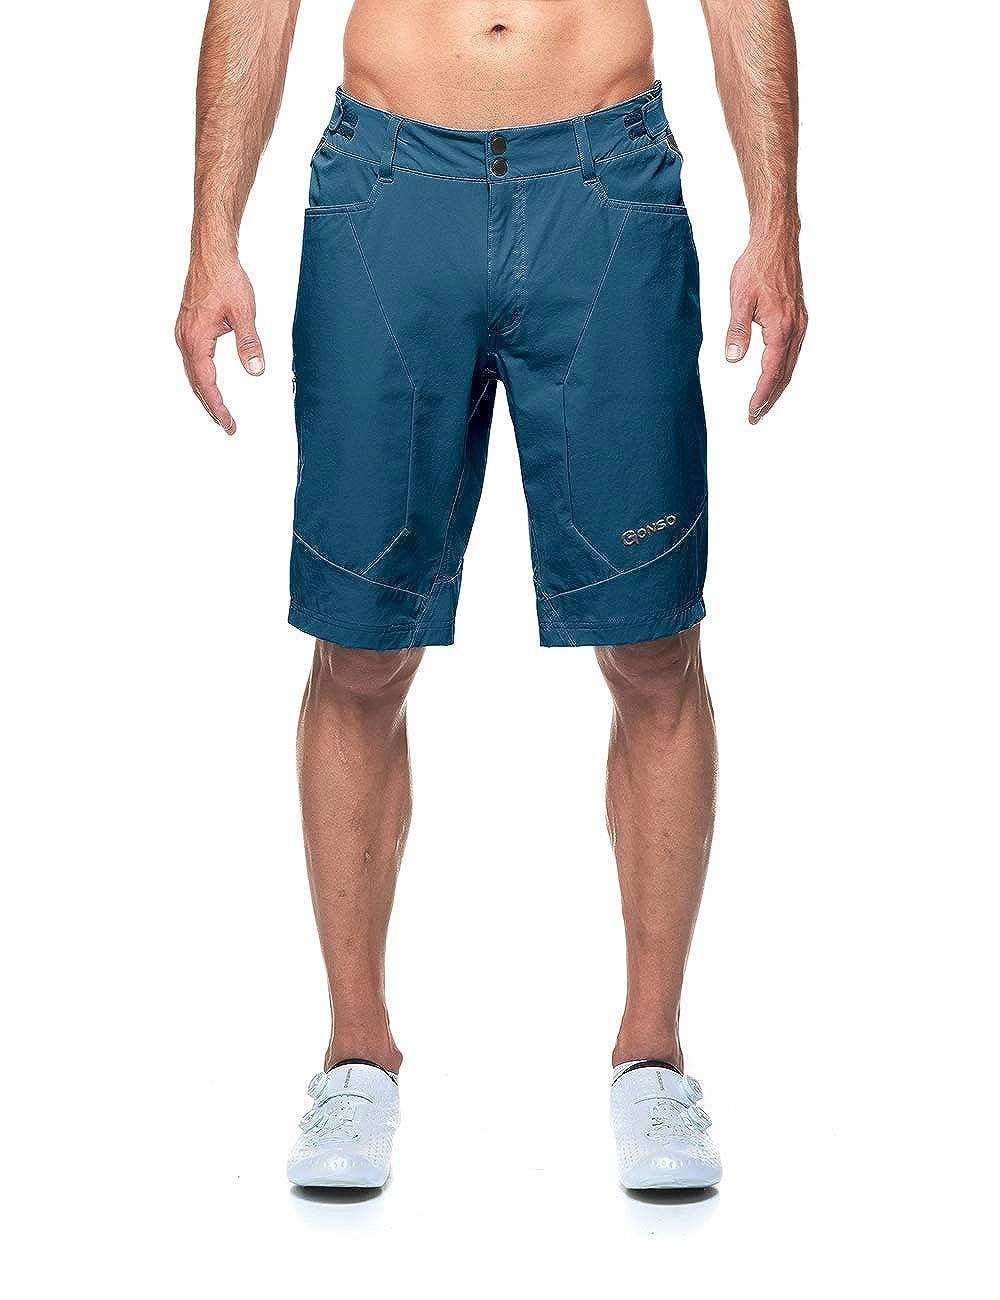 Majolica bluee 4XL Gonso Men's Orit Shorts